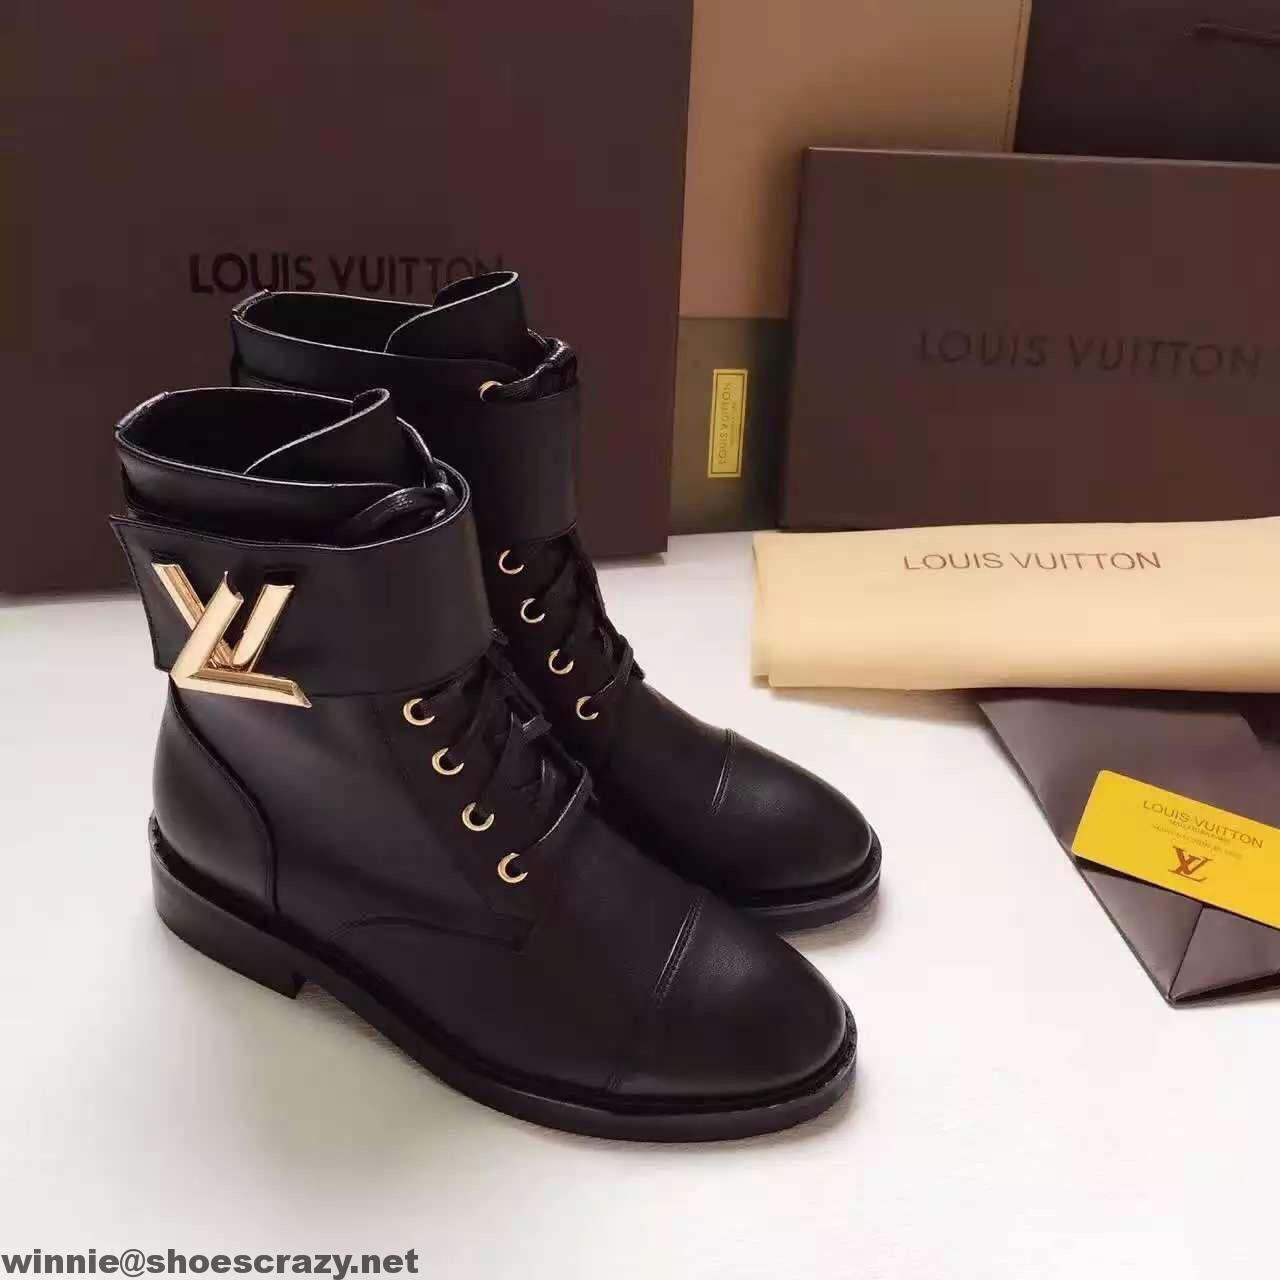 a09b4a293011 Louis Vuitton Wonderland Ranger Boots 1A1IY7 2016 Contact me what s app  +13569657072